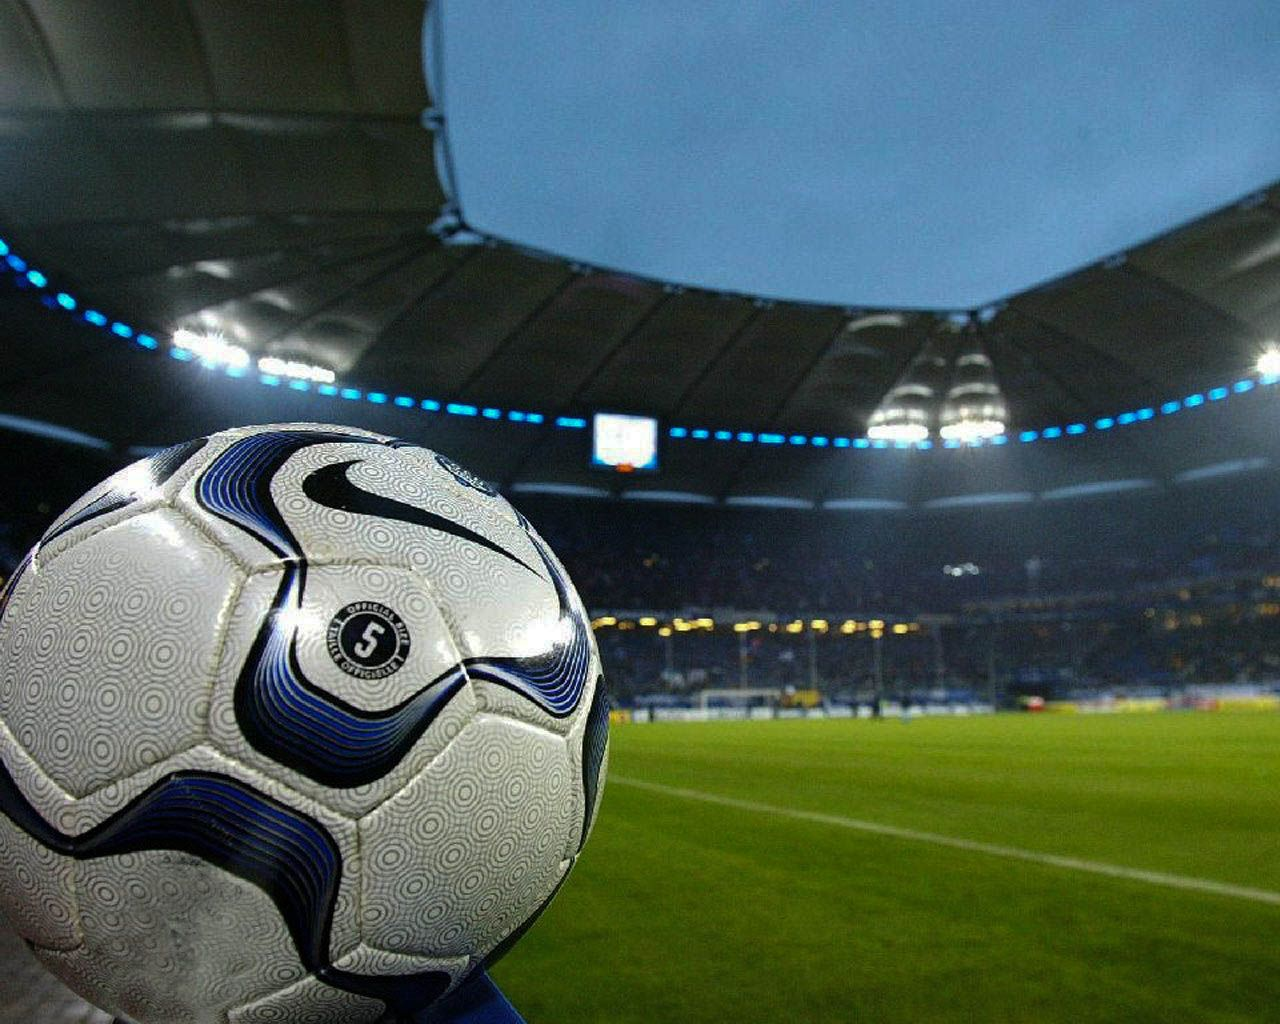 Soccer Stunning High Resolution Hd Wallpapers All Hd Wallpapers Soccer Football Wallpaper Soccer Online